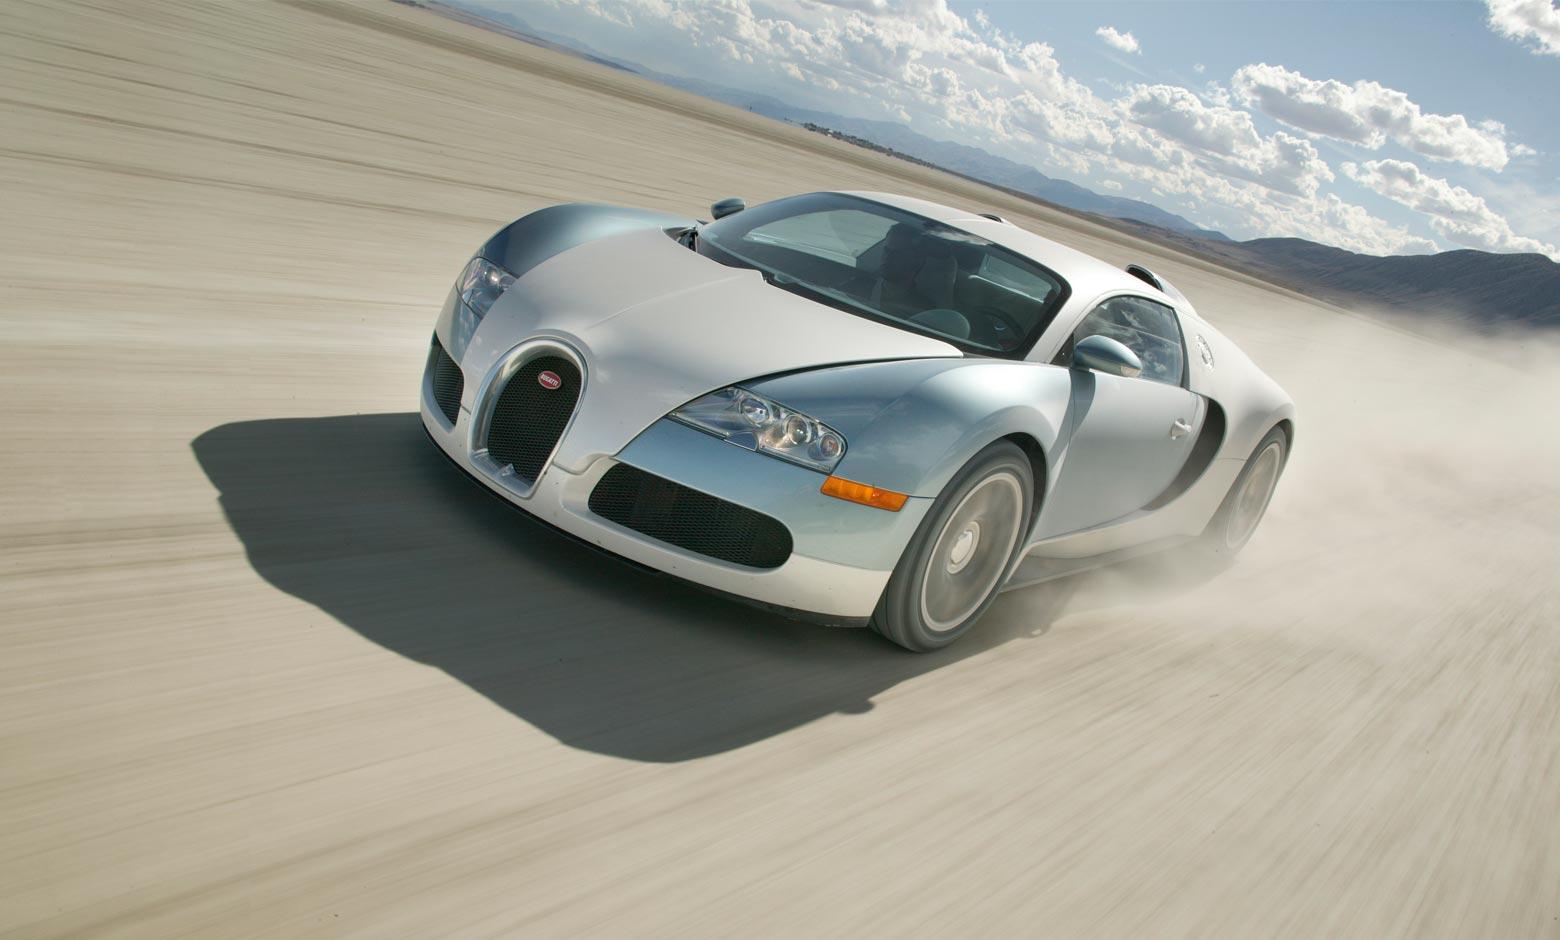 Bugatti Veyron Backgrounds, Compatible - PC, Mobile, Gadgets| 1560x940 px